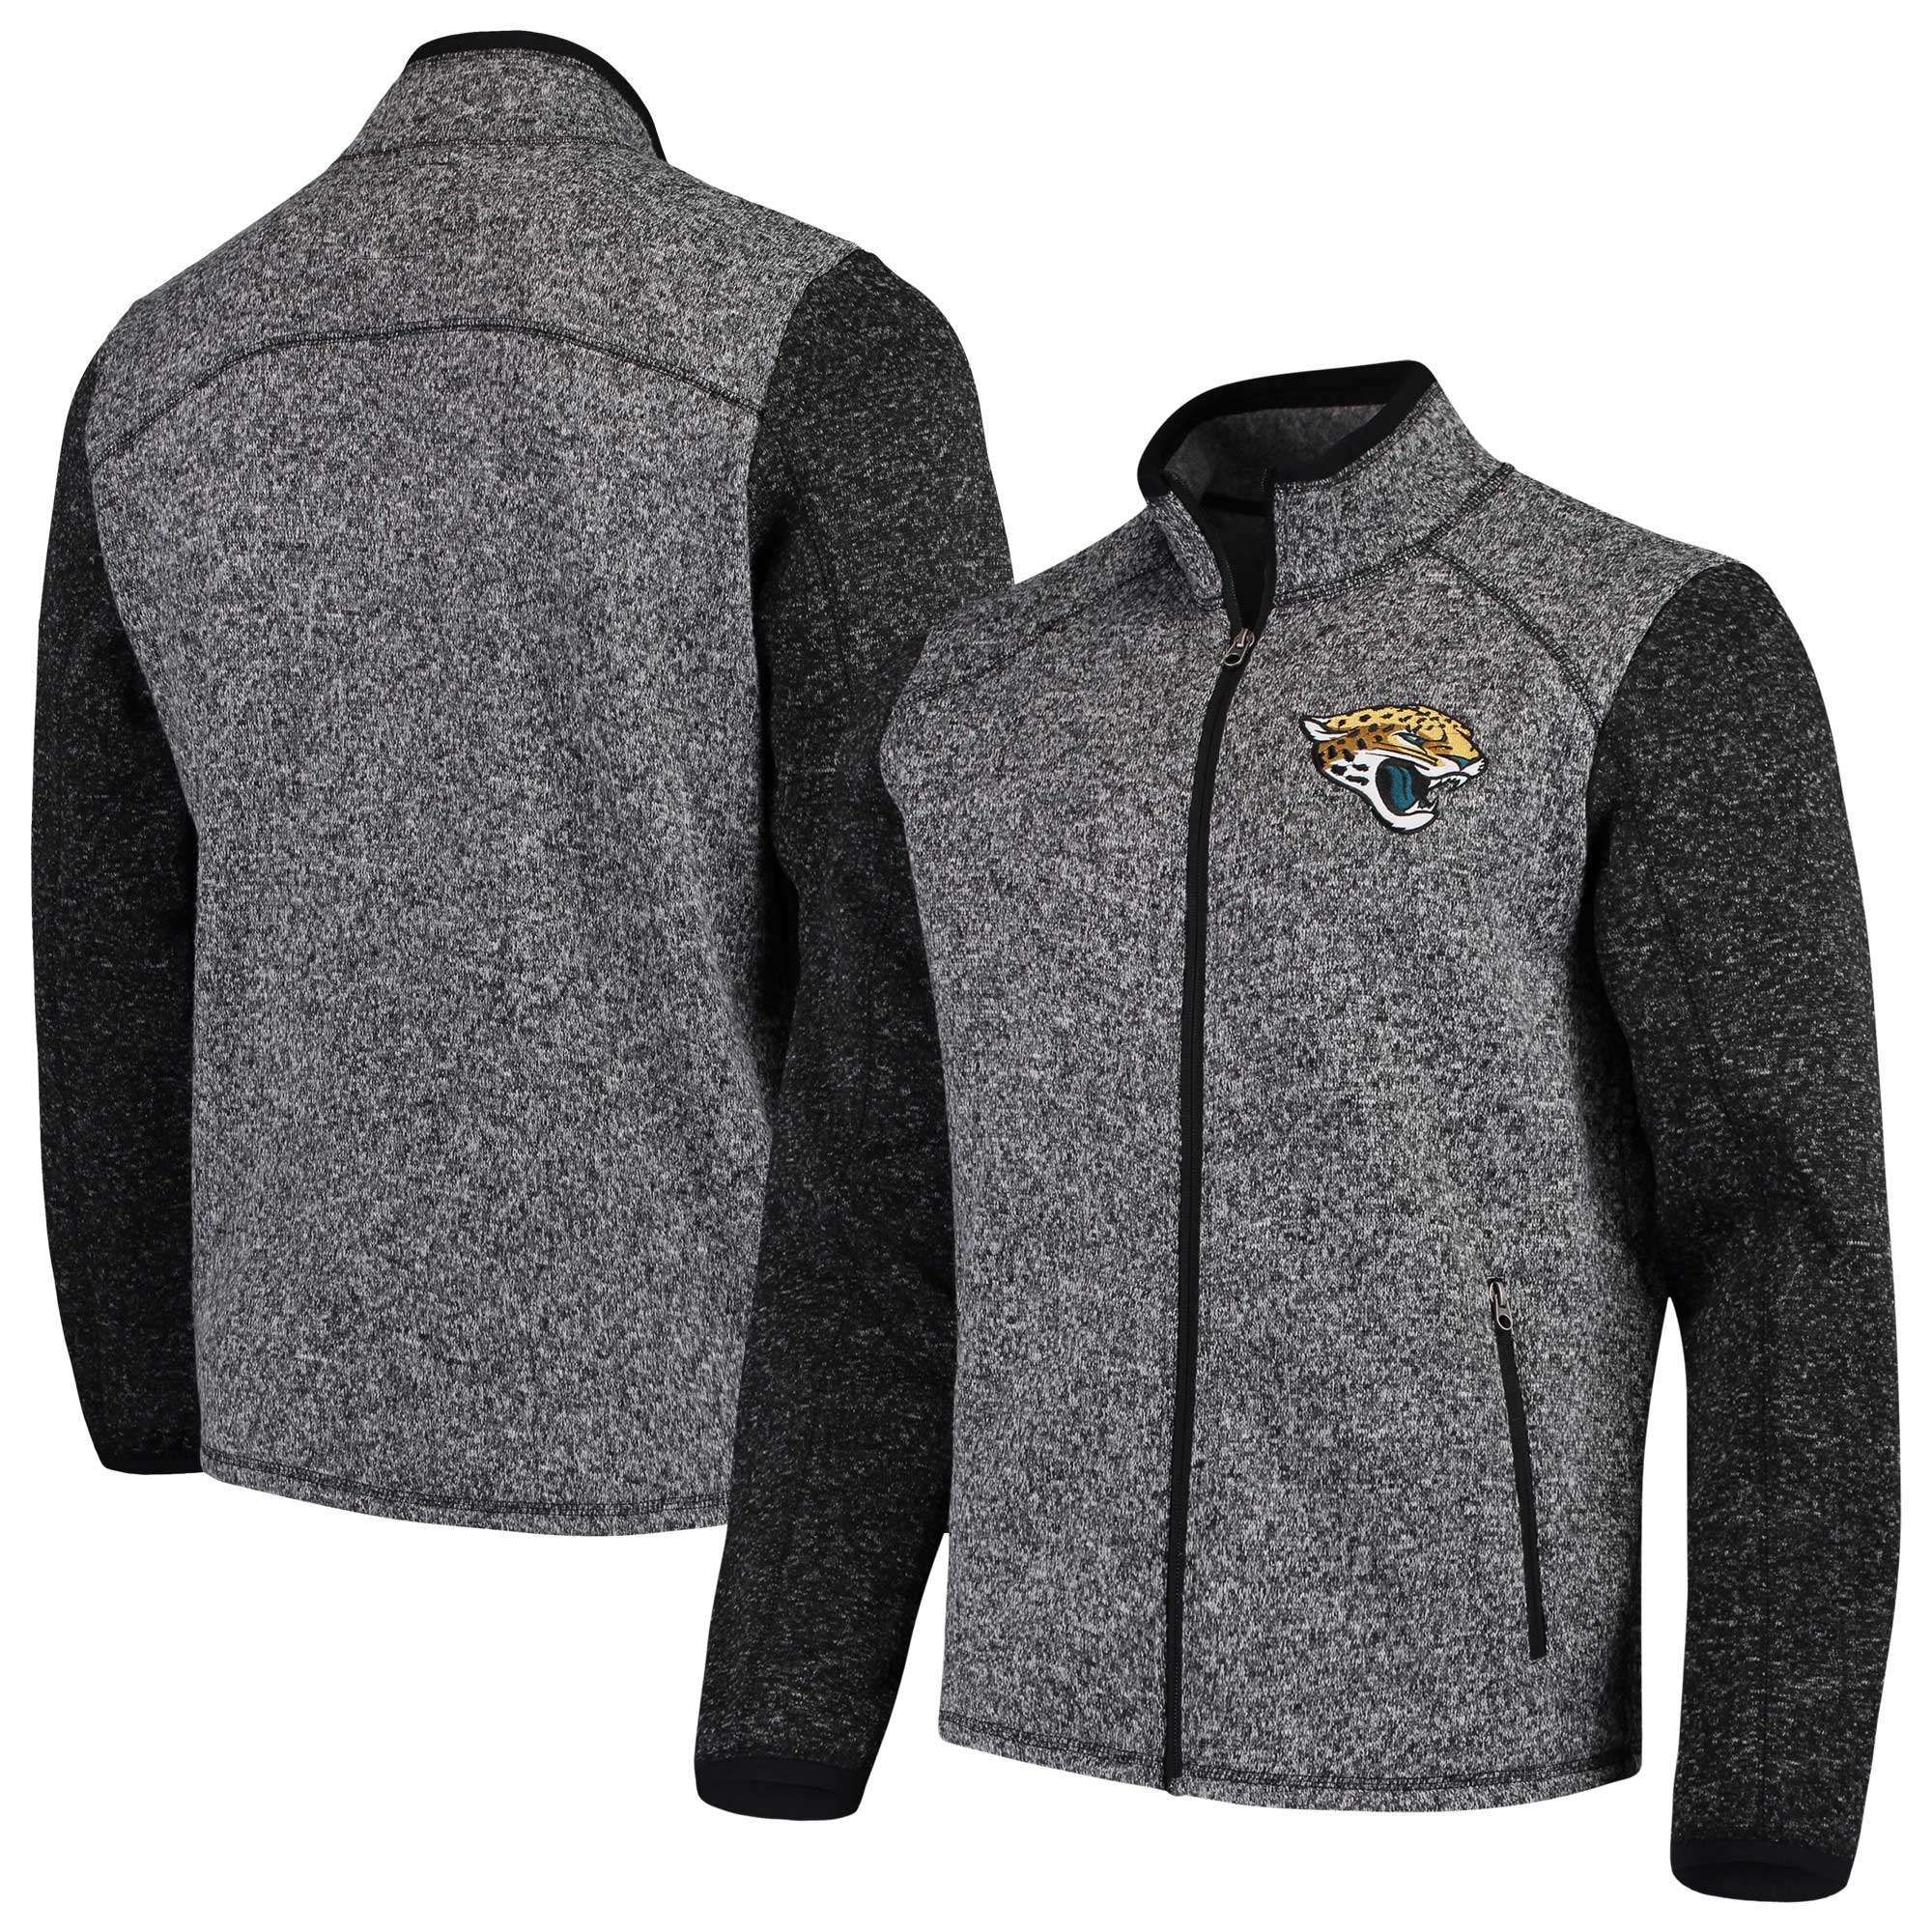 Jacksonville Jaguars G-III Sports by Carl Banks Alpine Zone Sweater Fleece Full-Zip Jacket - Heathered Charcoal